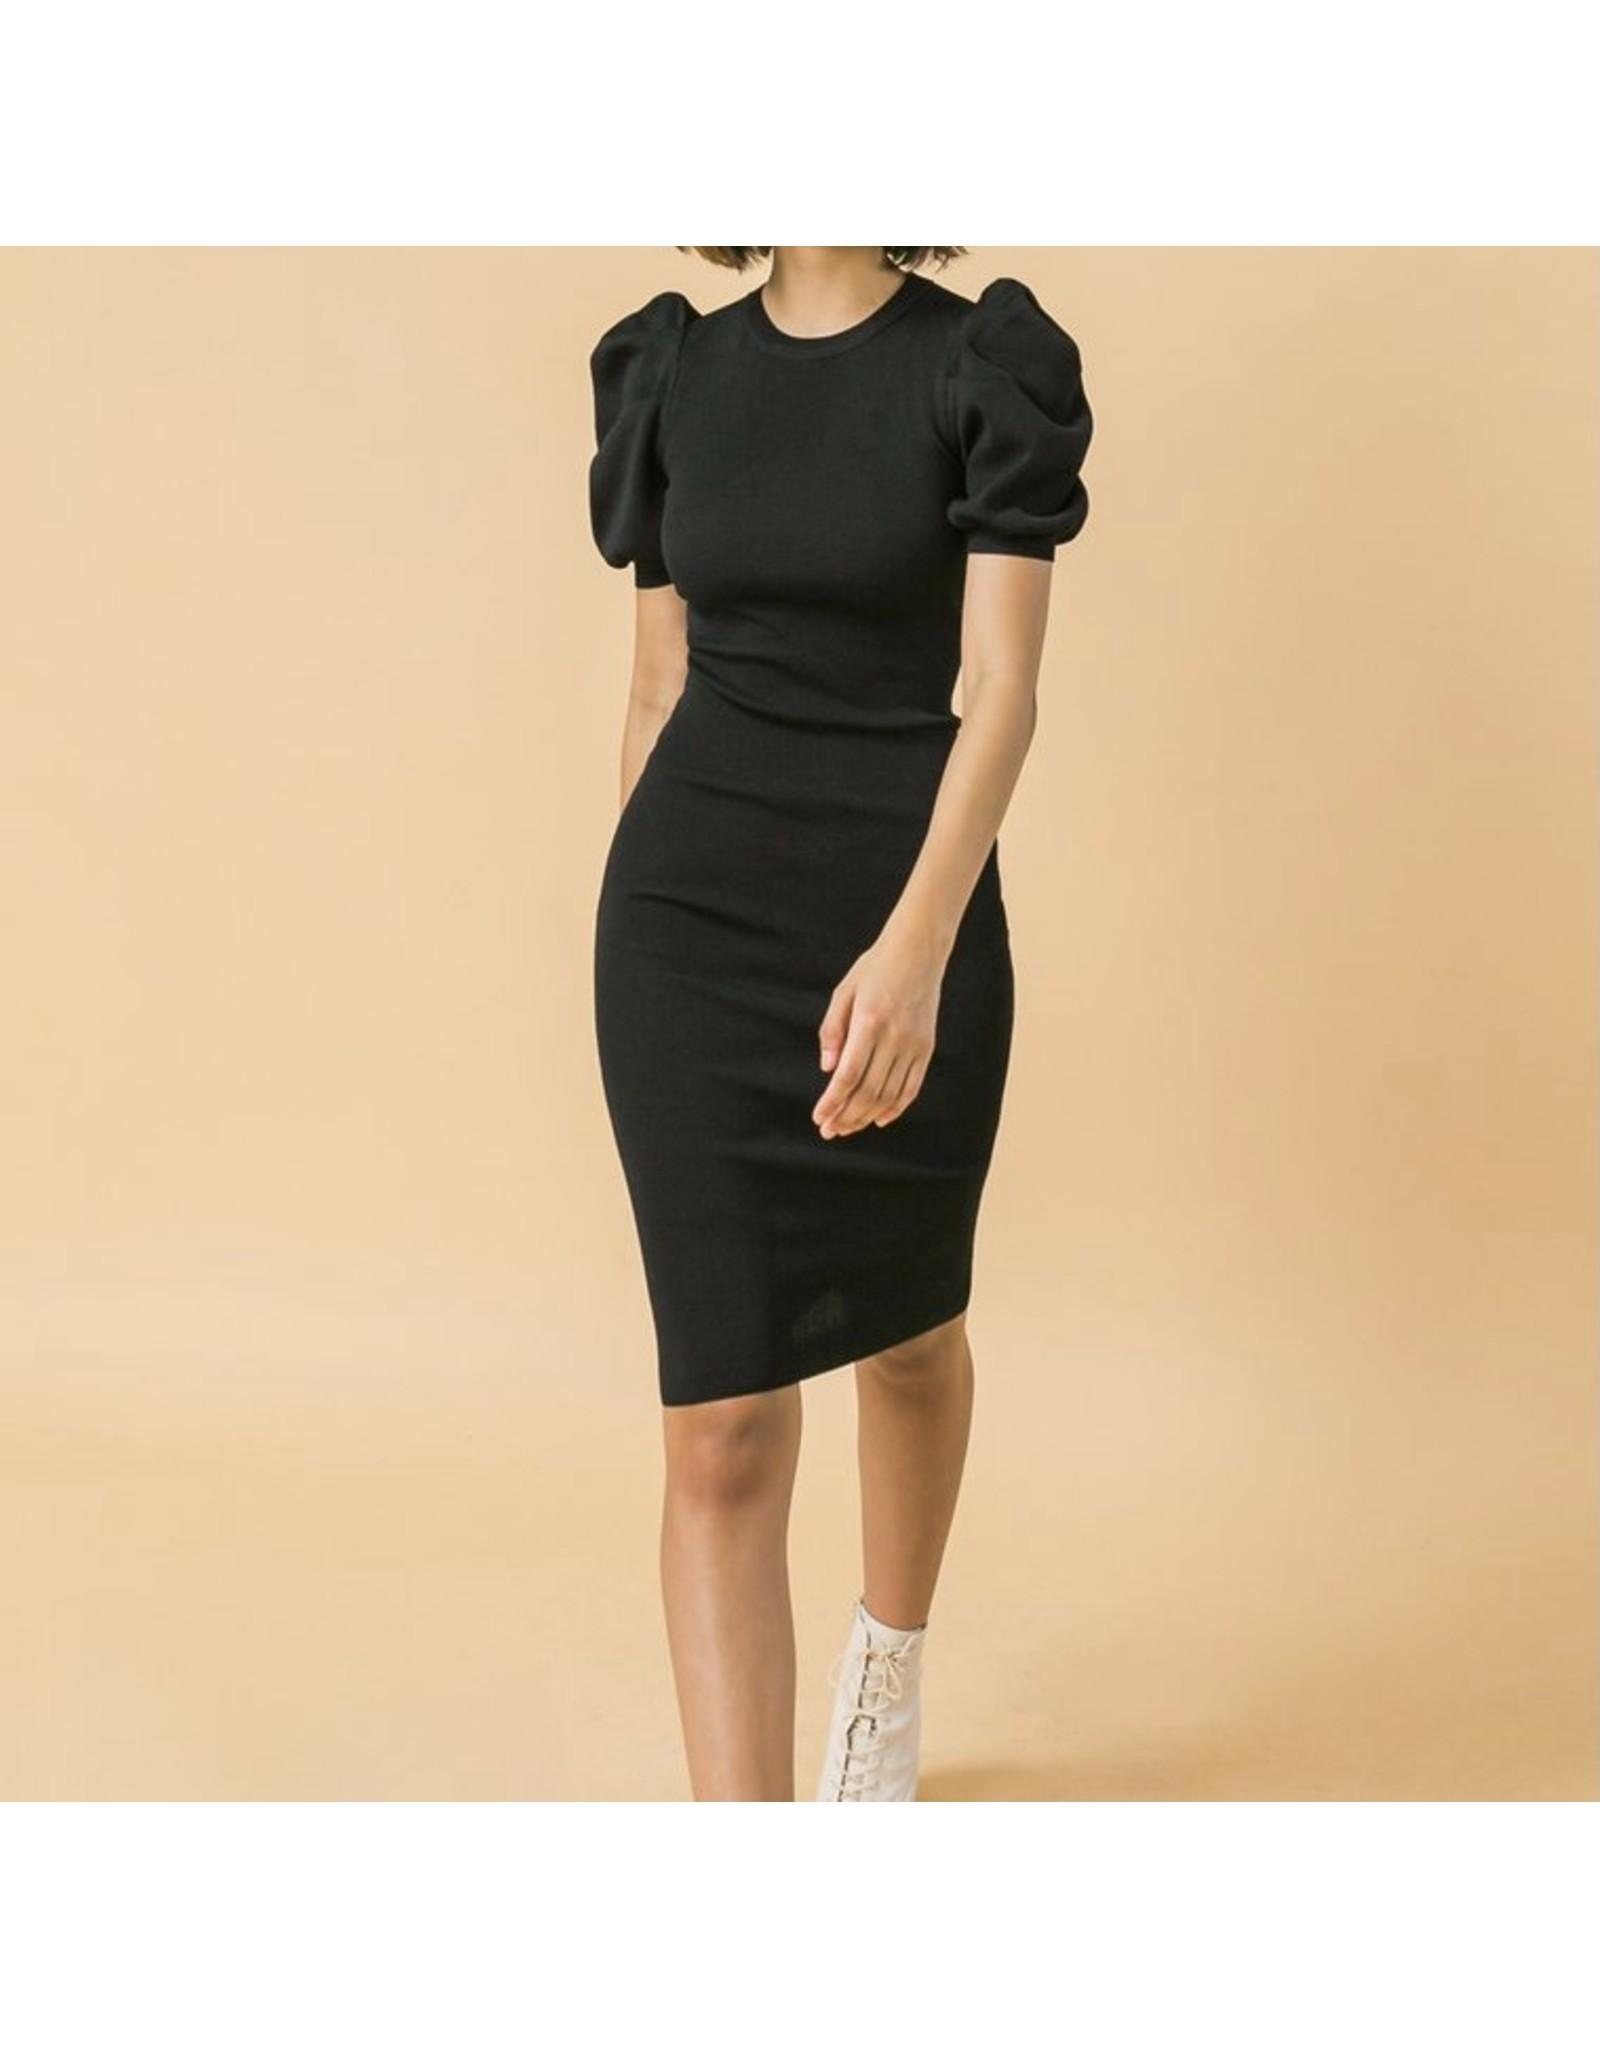 Puff Sleeves Sweater Midi Dress - Black